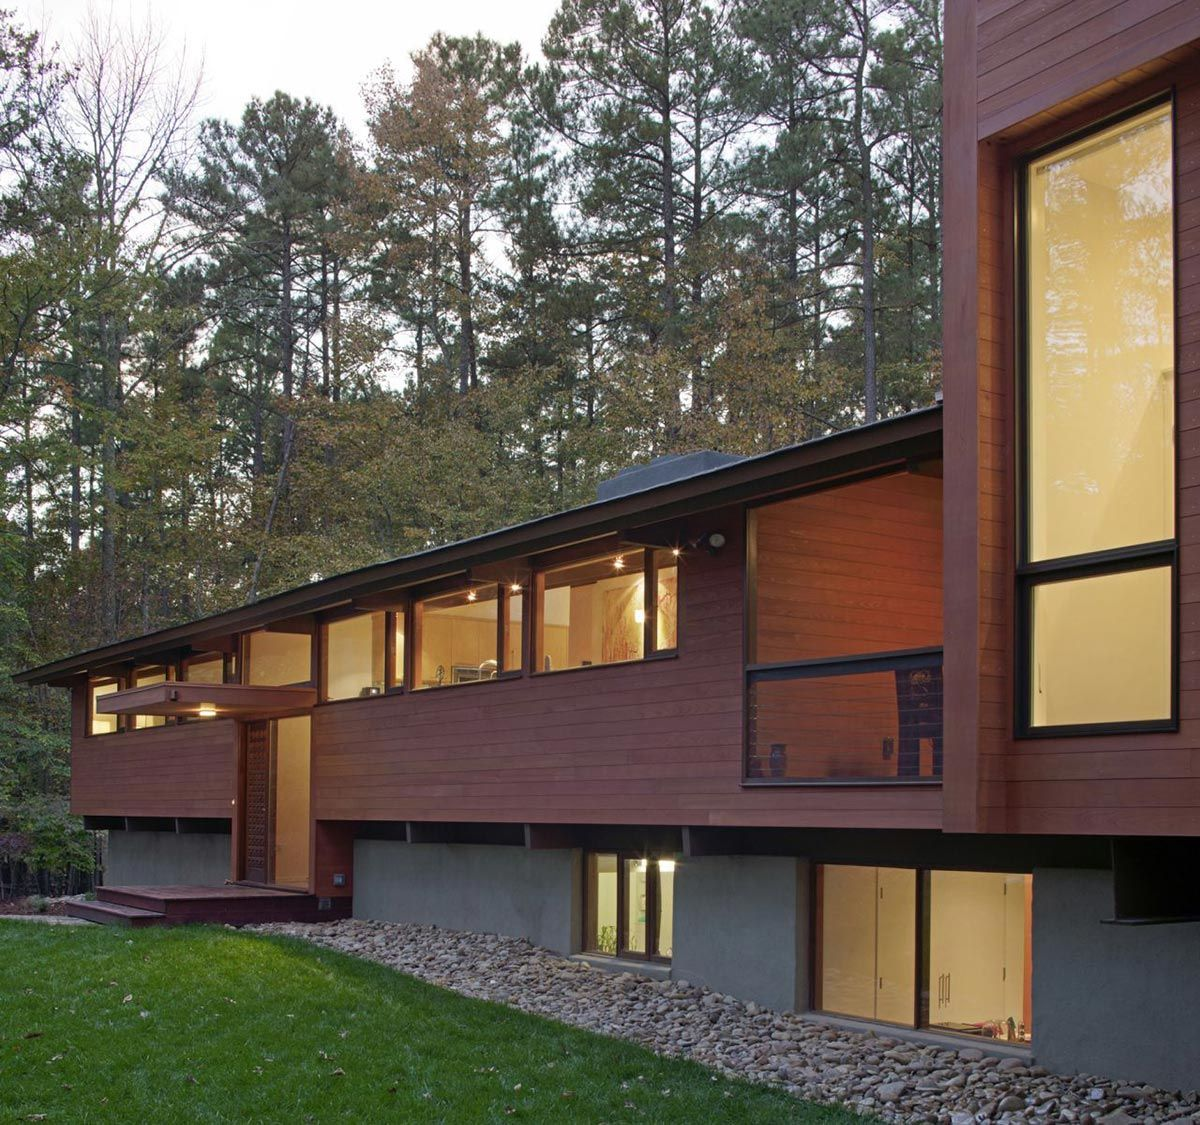 deck house renovation in chapel hill north carolina. Black Bedroom Furniture Sets. Home Design Ideas